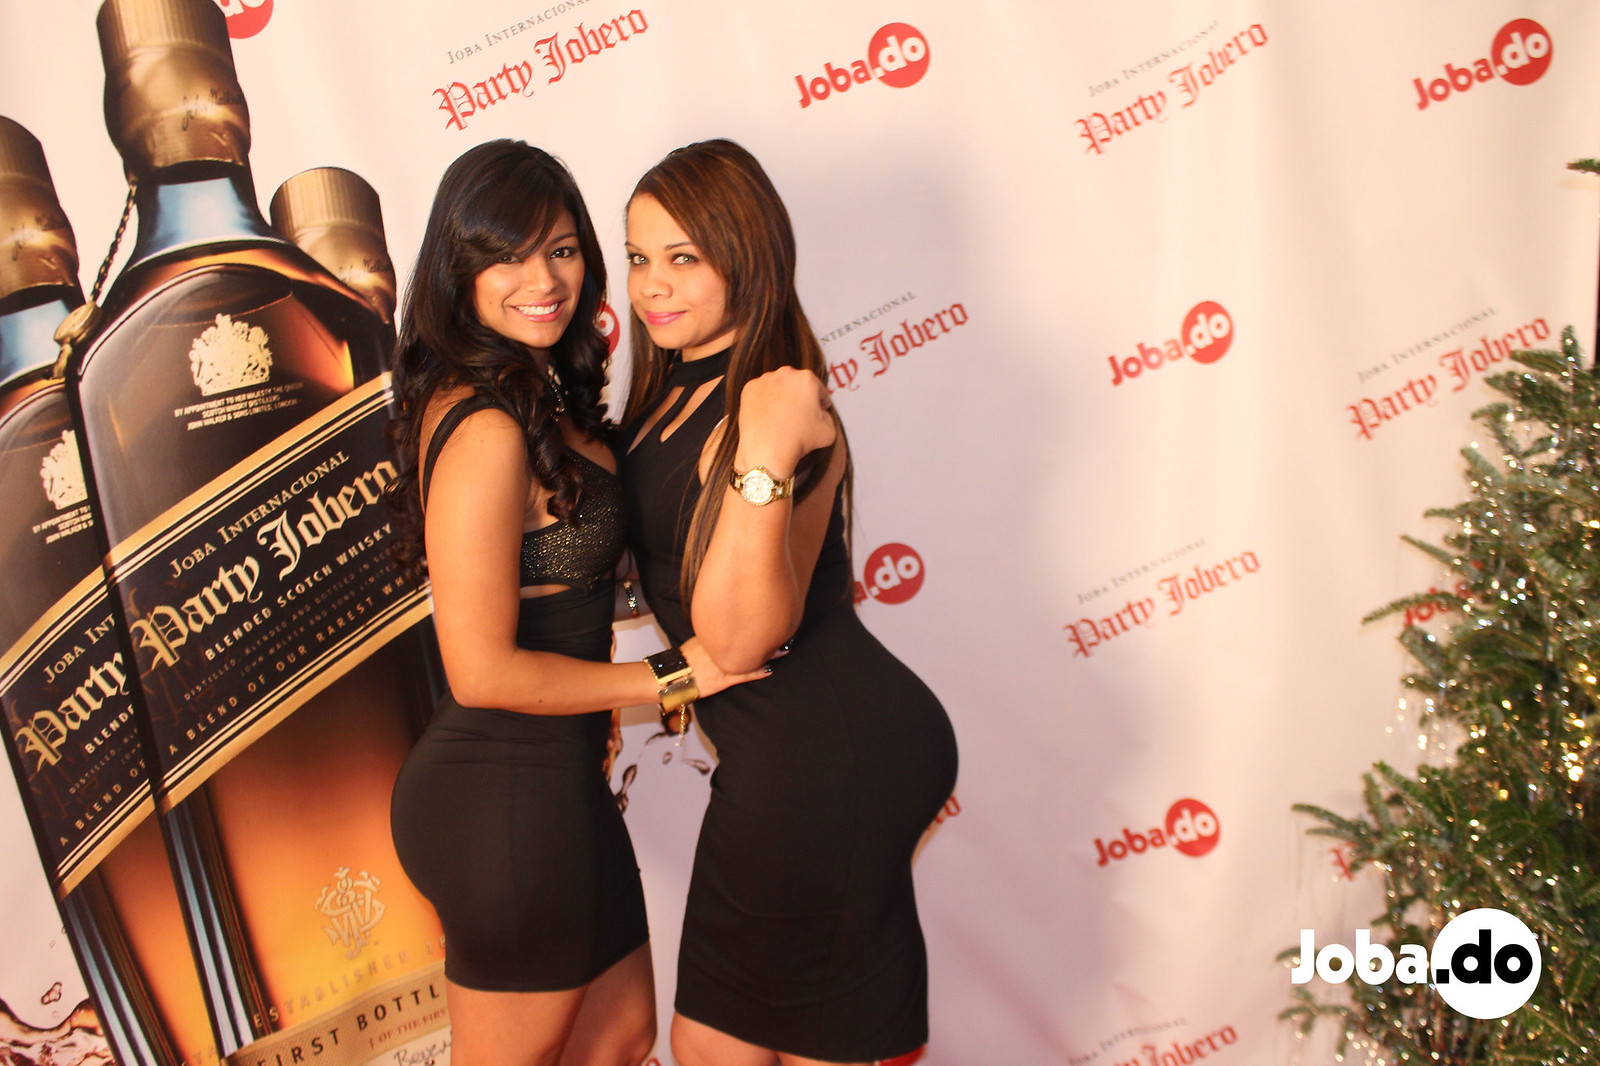 Party Jobero New York 2015 Parte 3